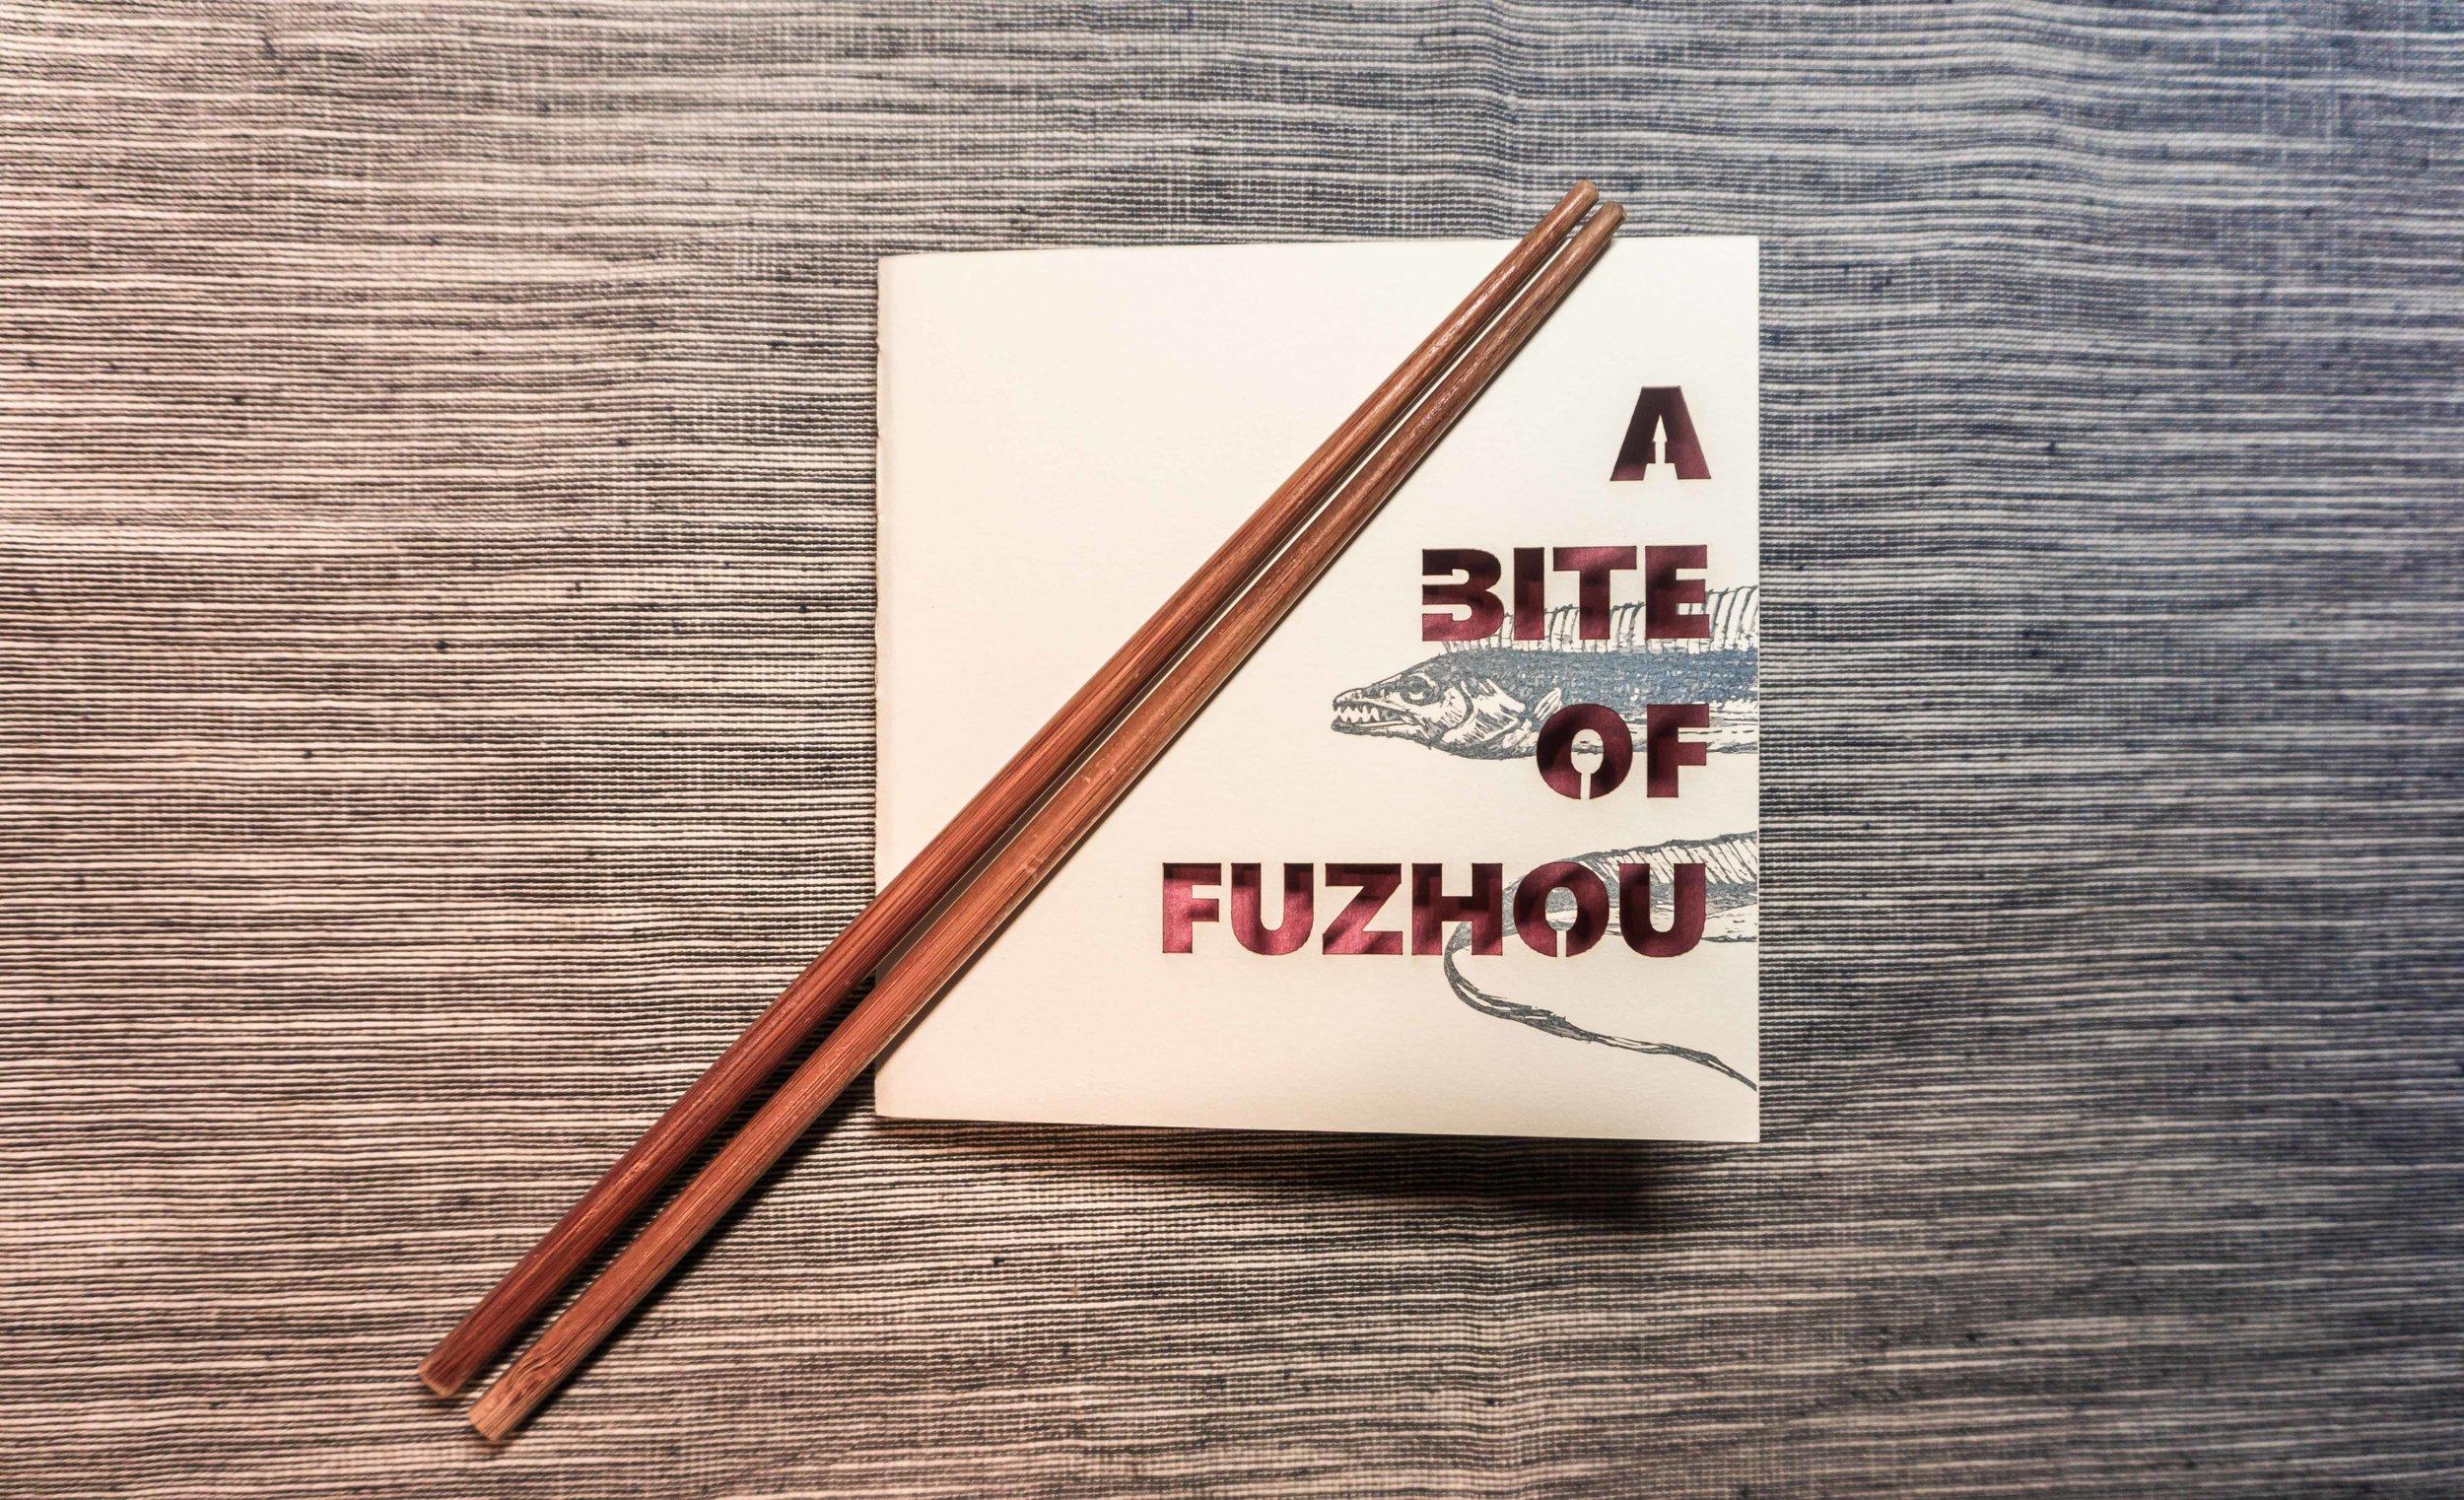 A BITE OF FUZHOU